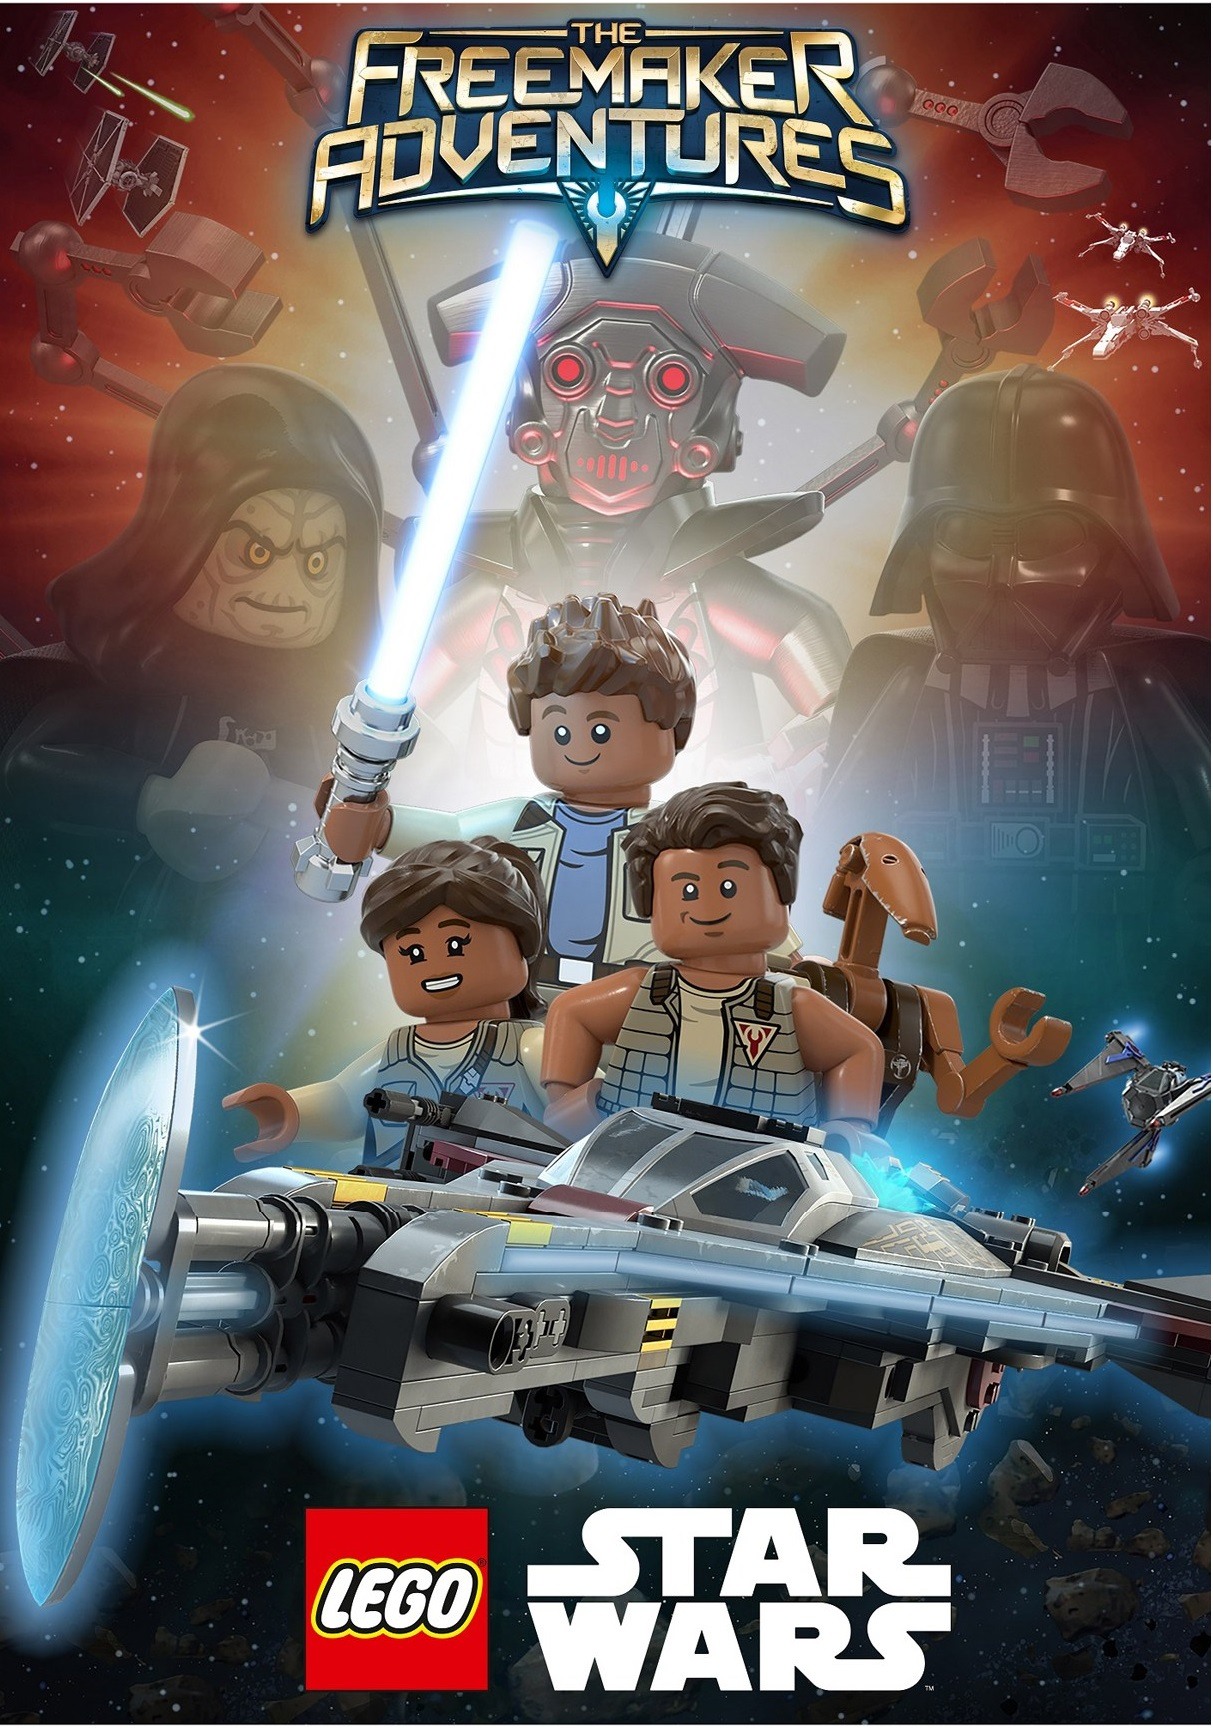 LEGO Star Wars: The Freemaker Adventures Season Two